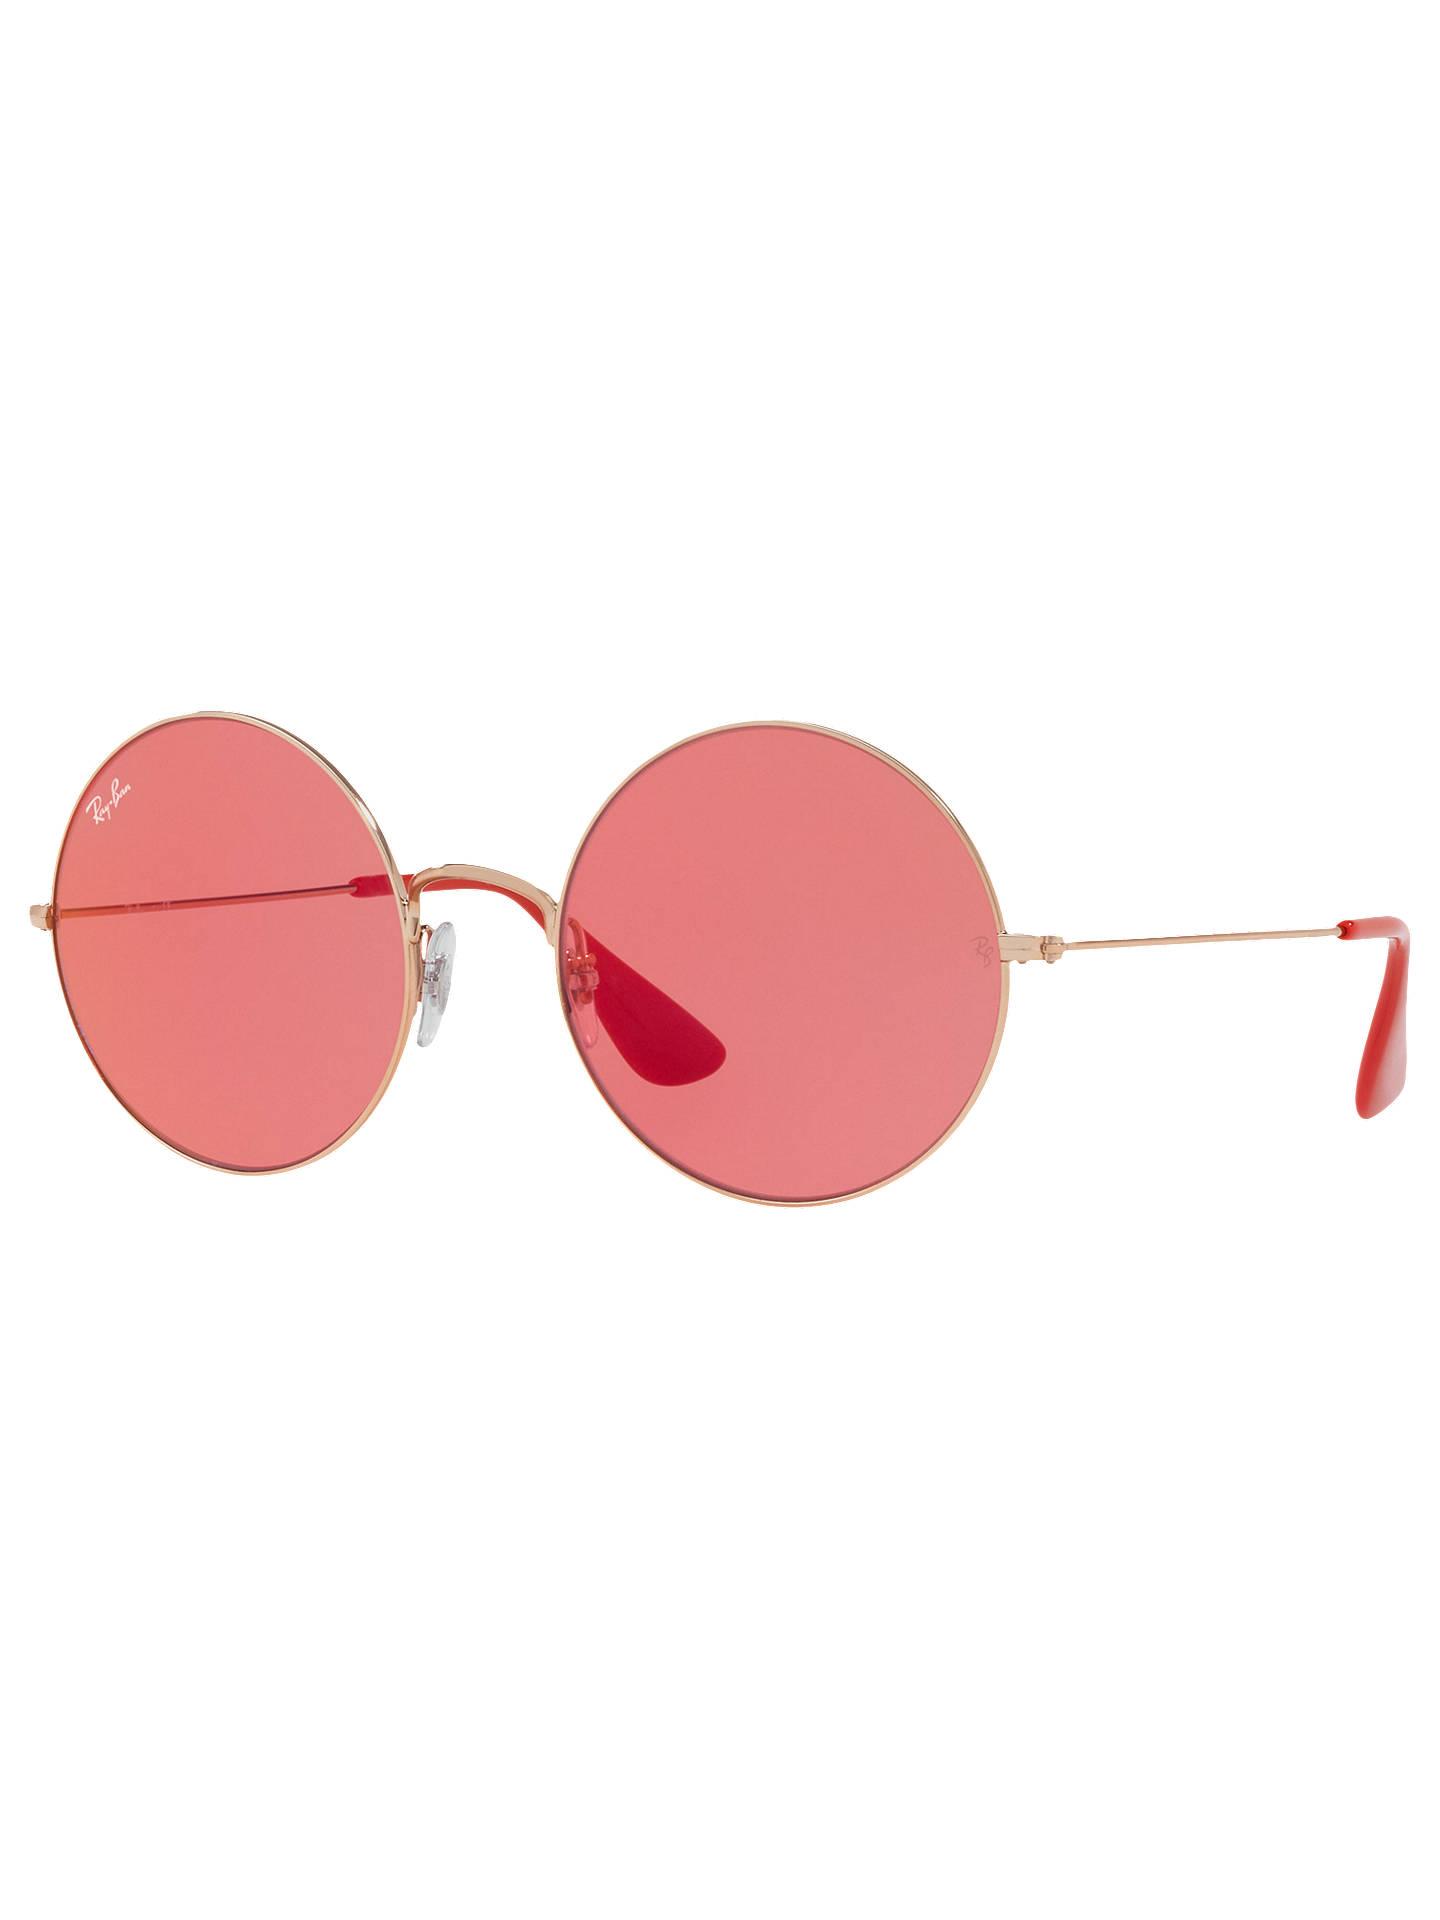 59b5ae1137 Ray-Ban RB3592 Ja-Jo Round Sunglasses at John Lewis   Partners